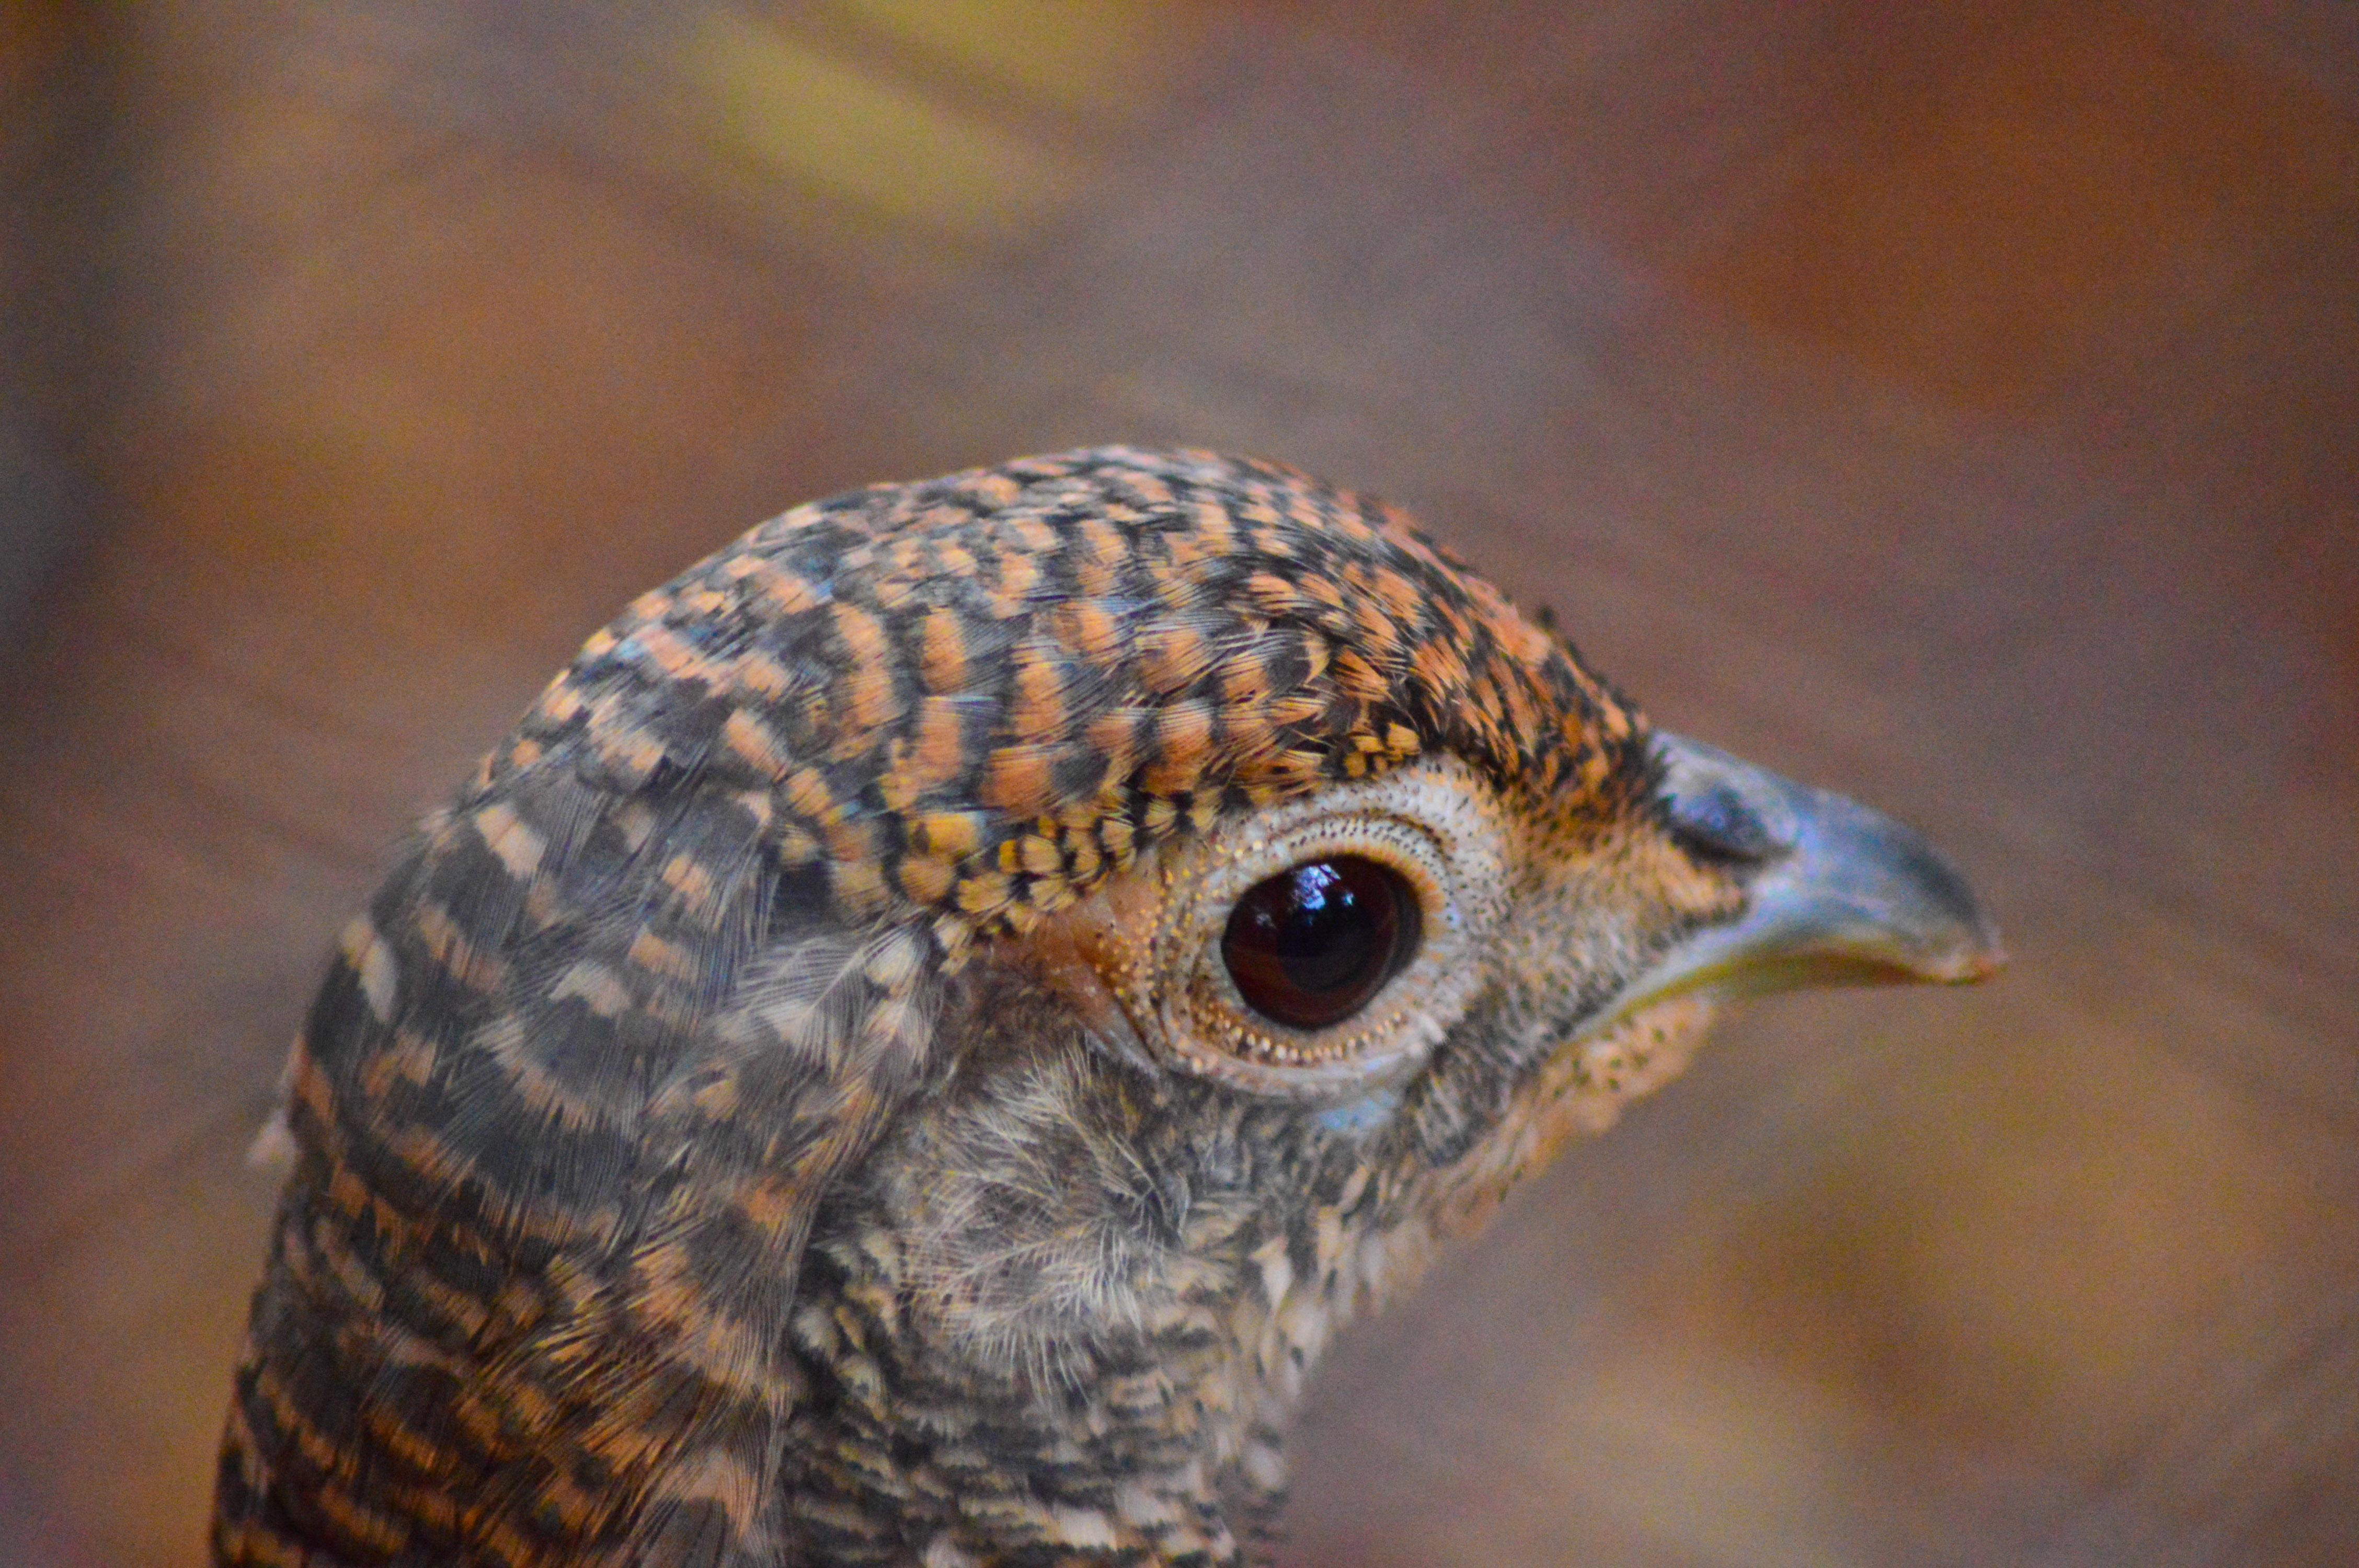 Bird, Animals, Beautiful, Colors, Head, HQ Photo